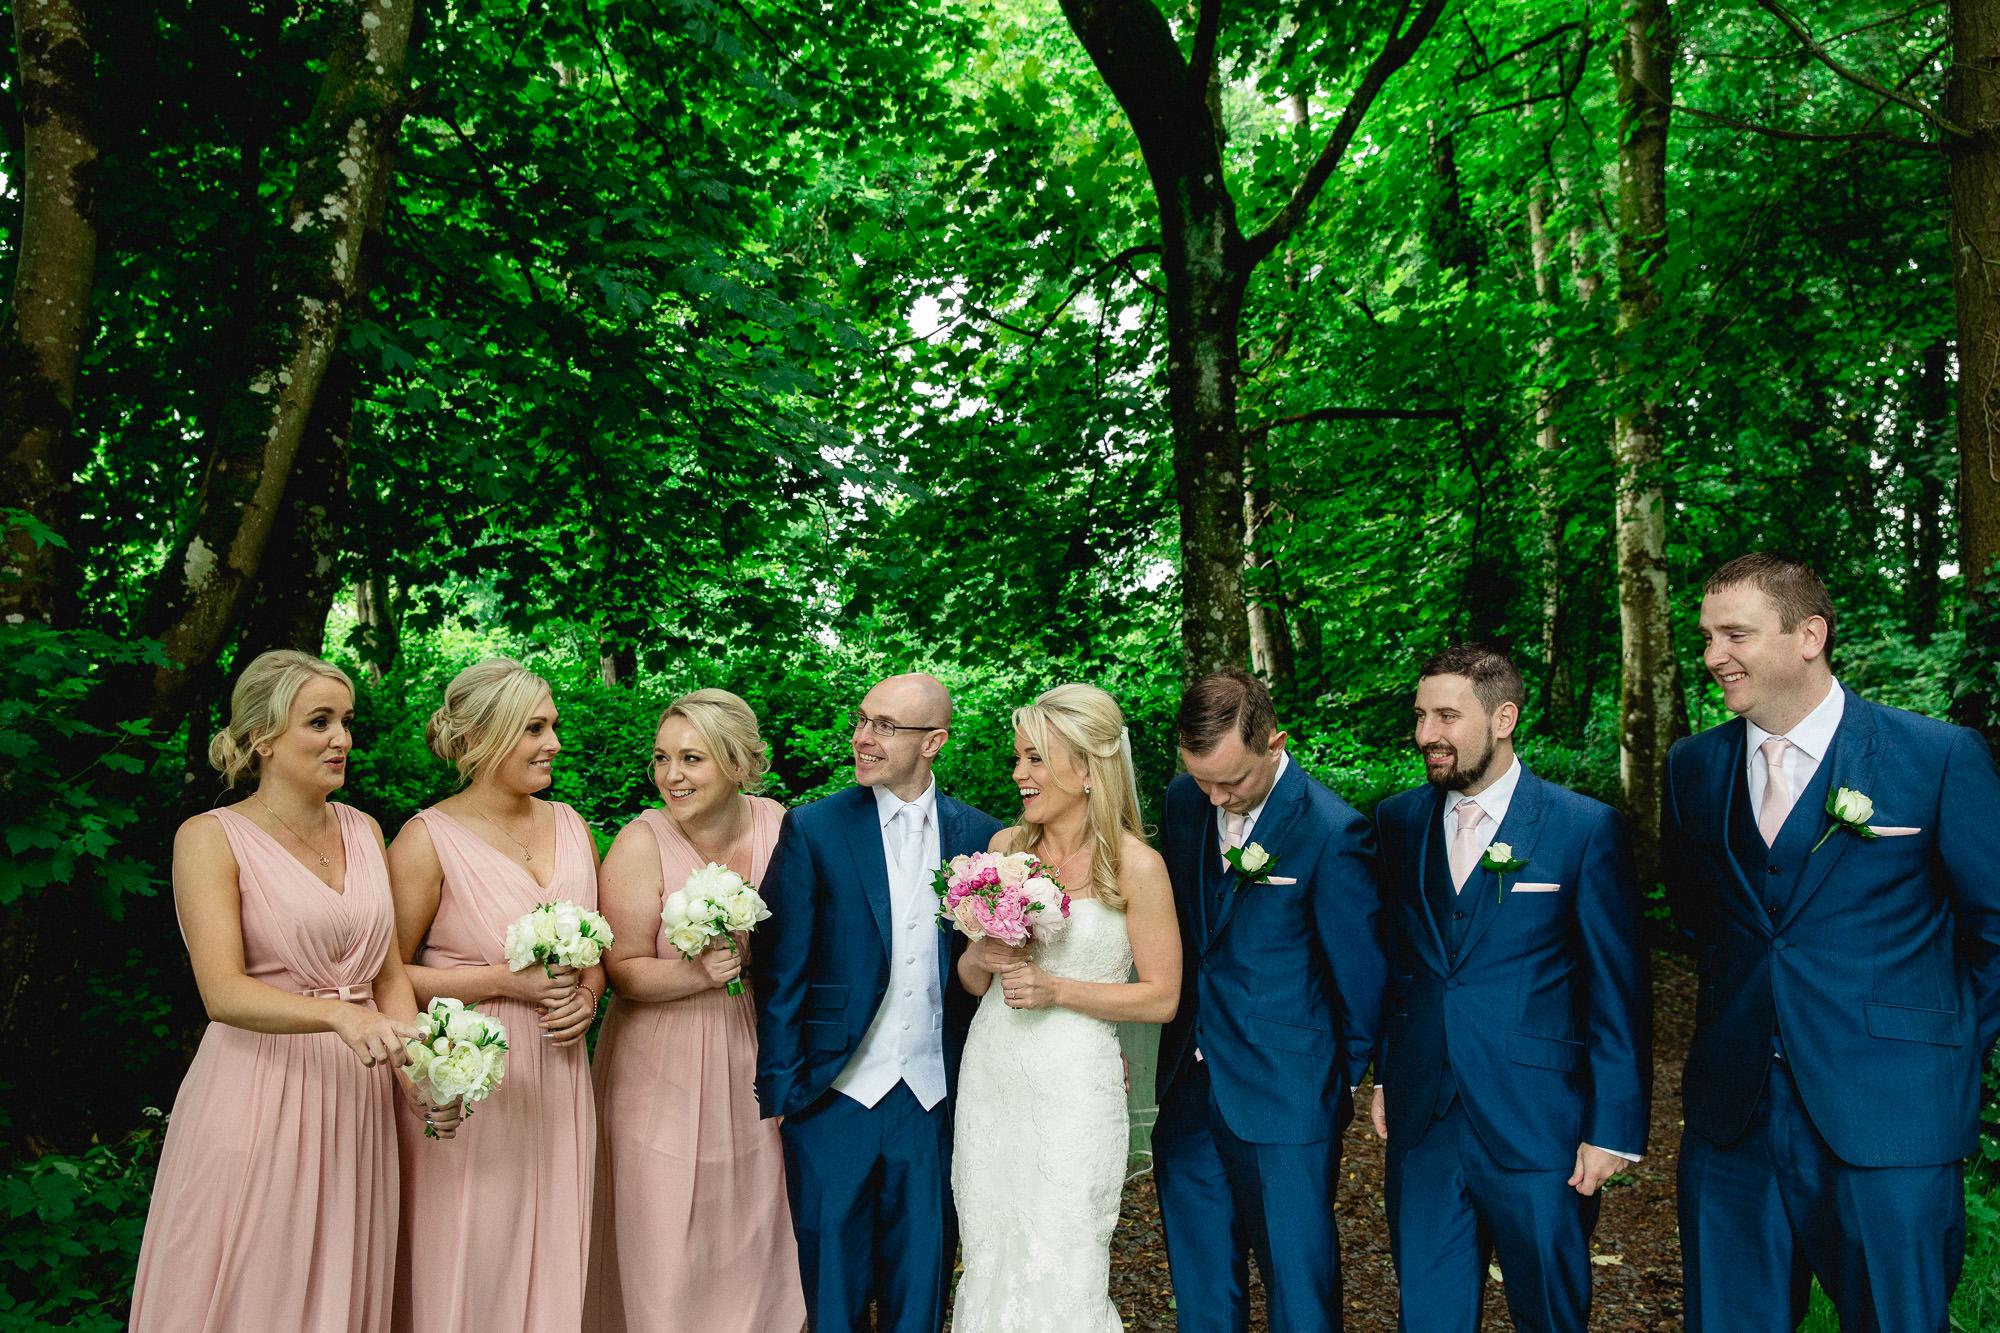 CLAIREBYRNEPHOTOGRAPHY-WEDDING-Ireland-tulffaris-alternative-fun-Lisa-terry-9.jpg